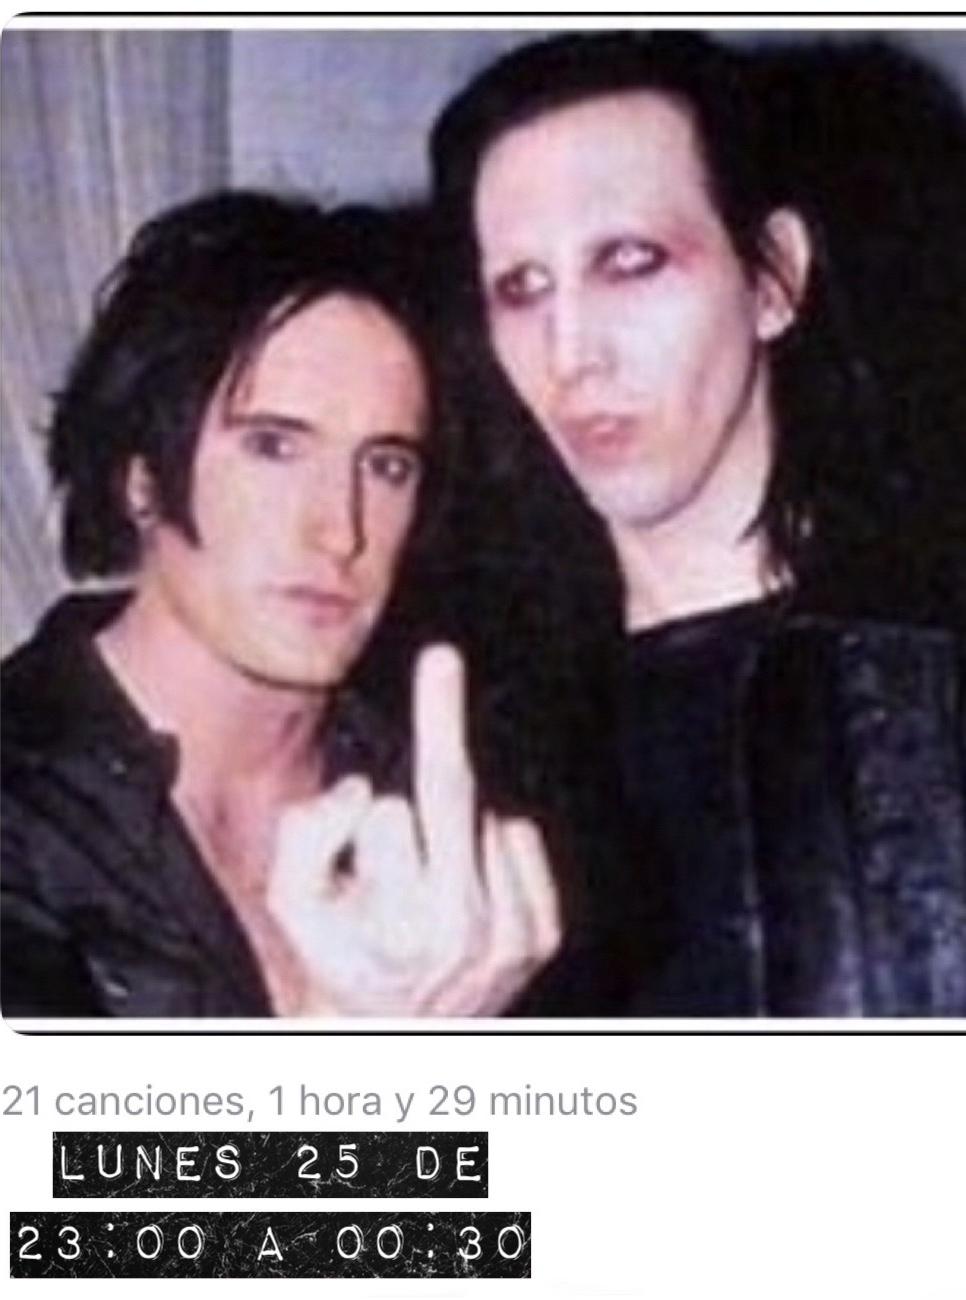 Marilyn ⚡️ Manson (el tópic del Reverendo) - Página 9 3ea0e810